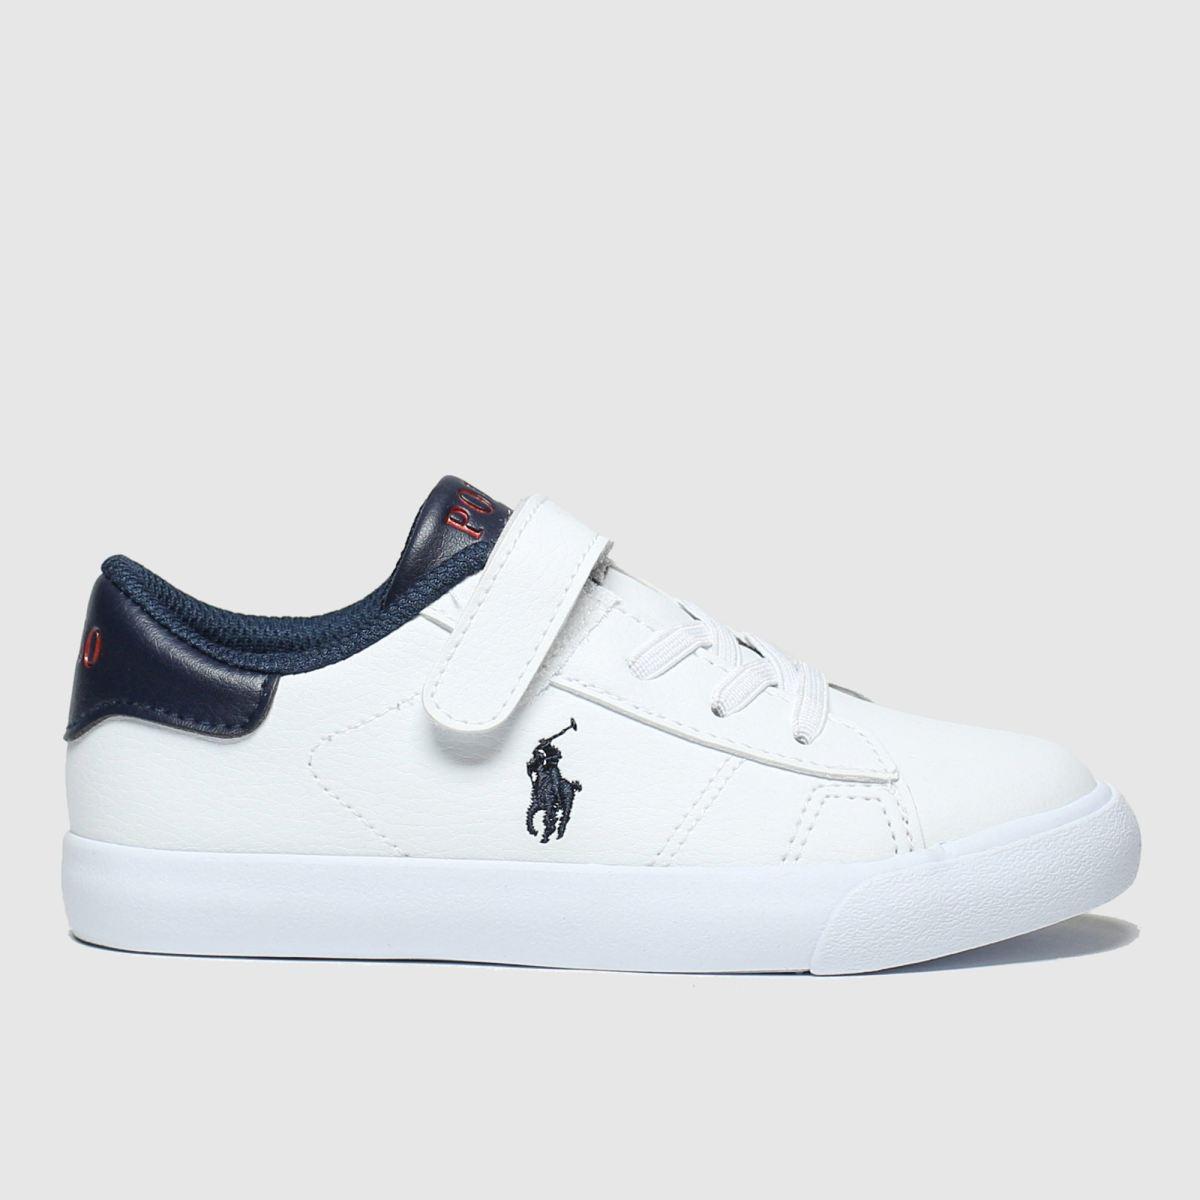 Polo Ralph Lauren White & Navy Pierce Ii Boots Toddler